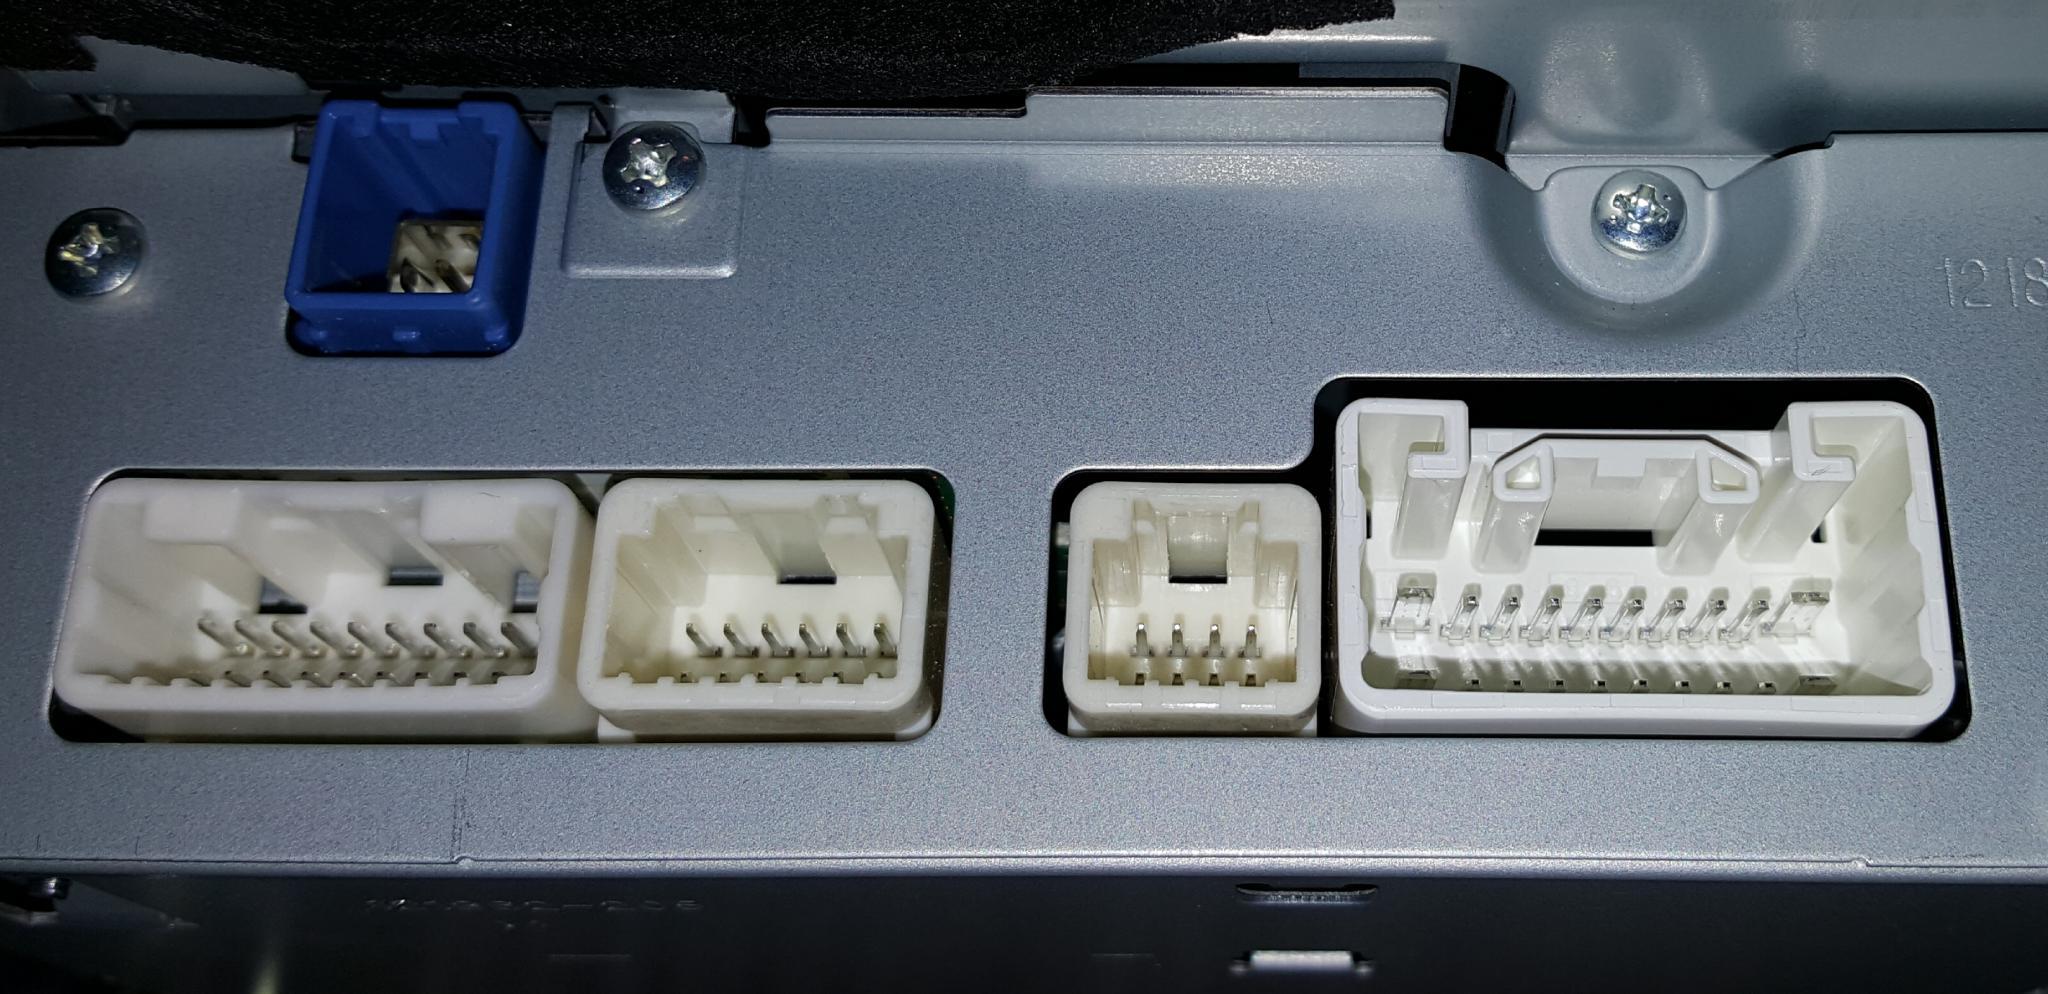 toyota jbl stereo wiring diagram 2011 head unit stereo wiring diagram for  14 help  toyota fj  head unit stereo wiring diagram for  14